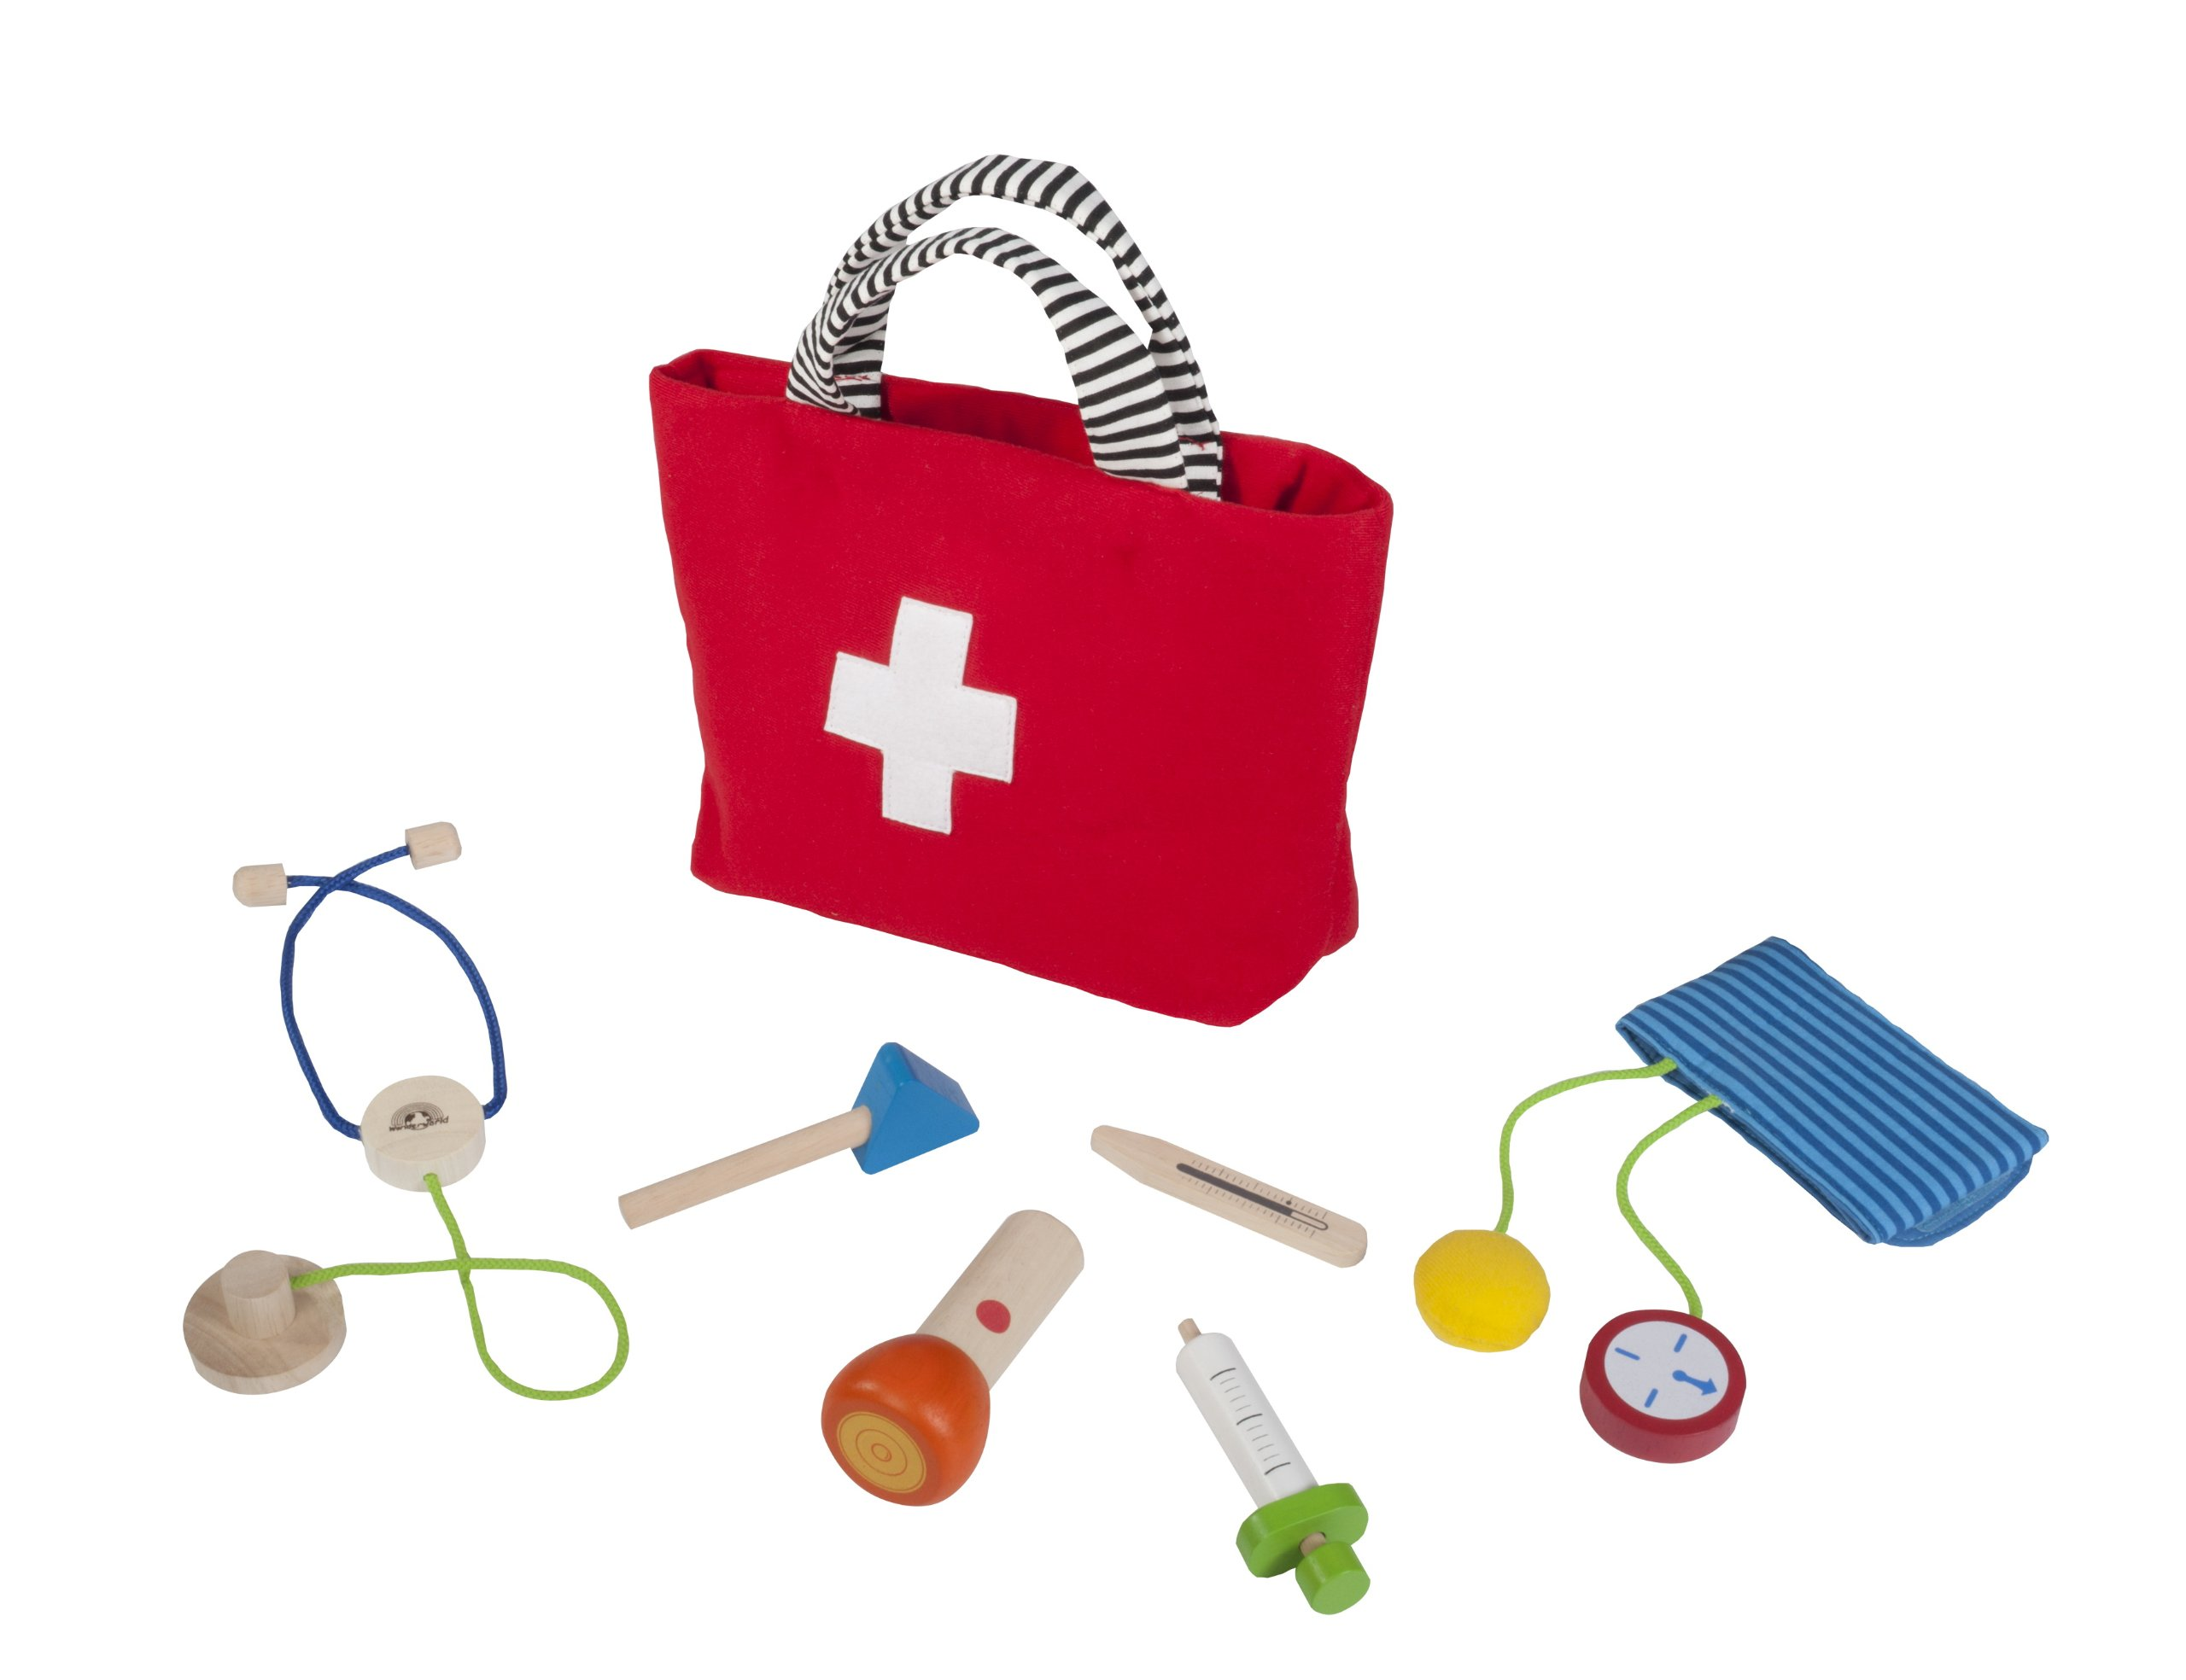 Wonderworld Handy Doctor Seven-Piece Wood Pretend Play Medical Checkup Kit Toy Set By Wonderworld